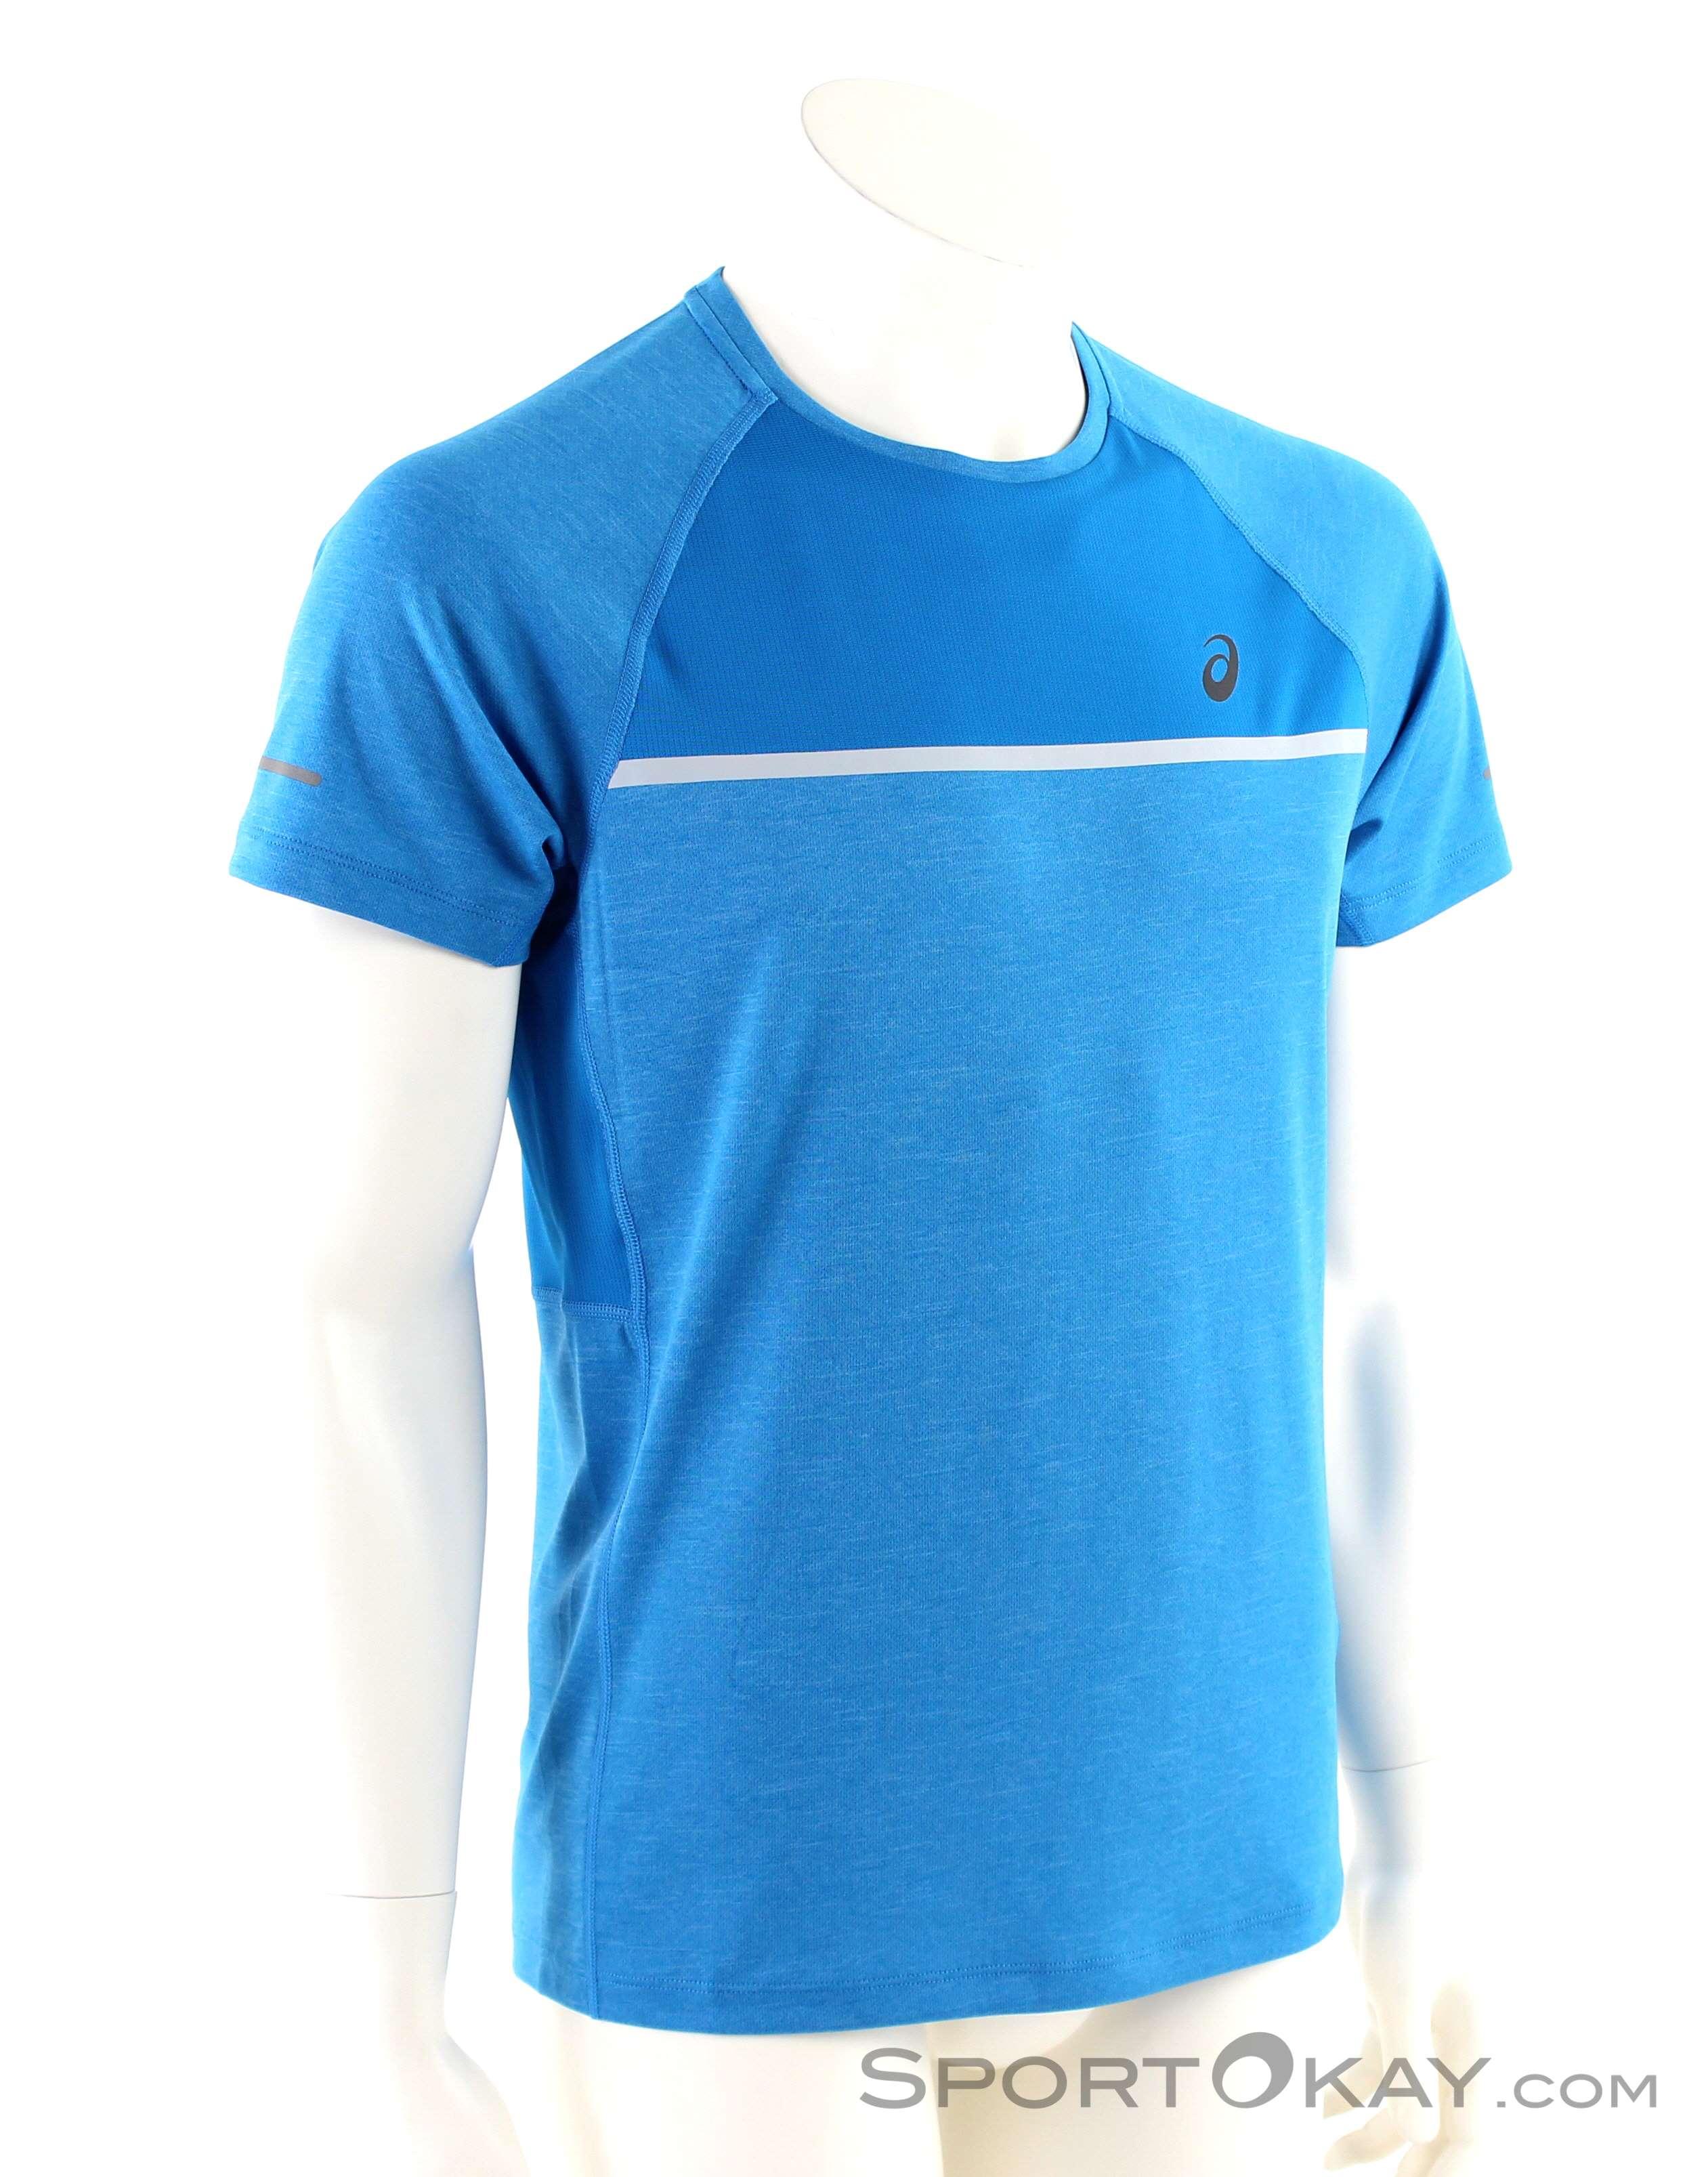 Asics Asics SS Top Herren T-Shirt